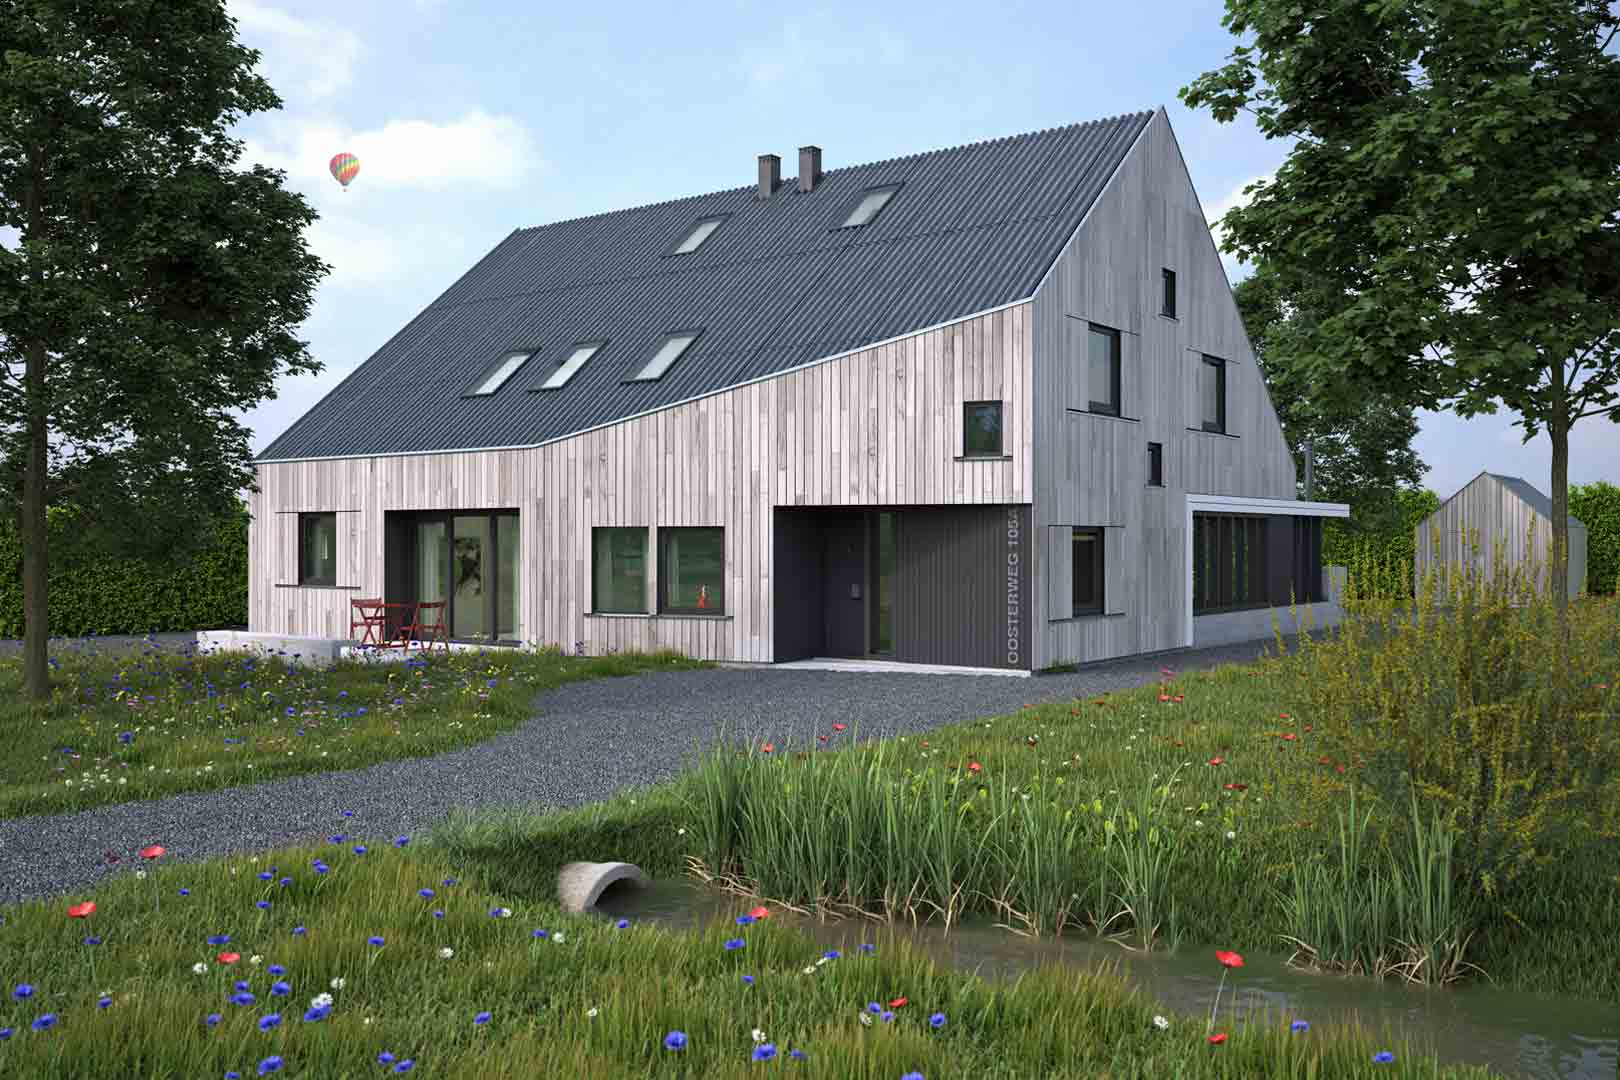 Architectuur visualisatie schuurwoning Haren